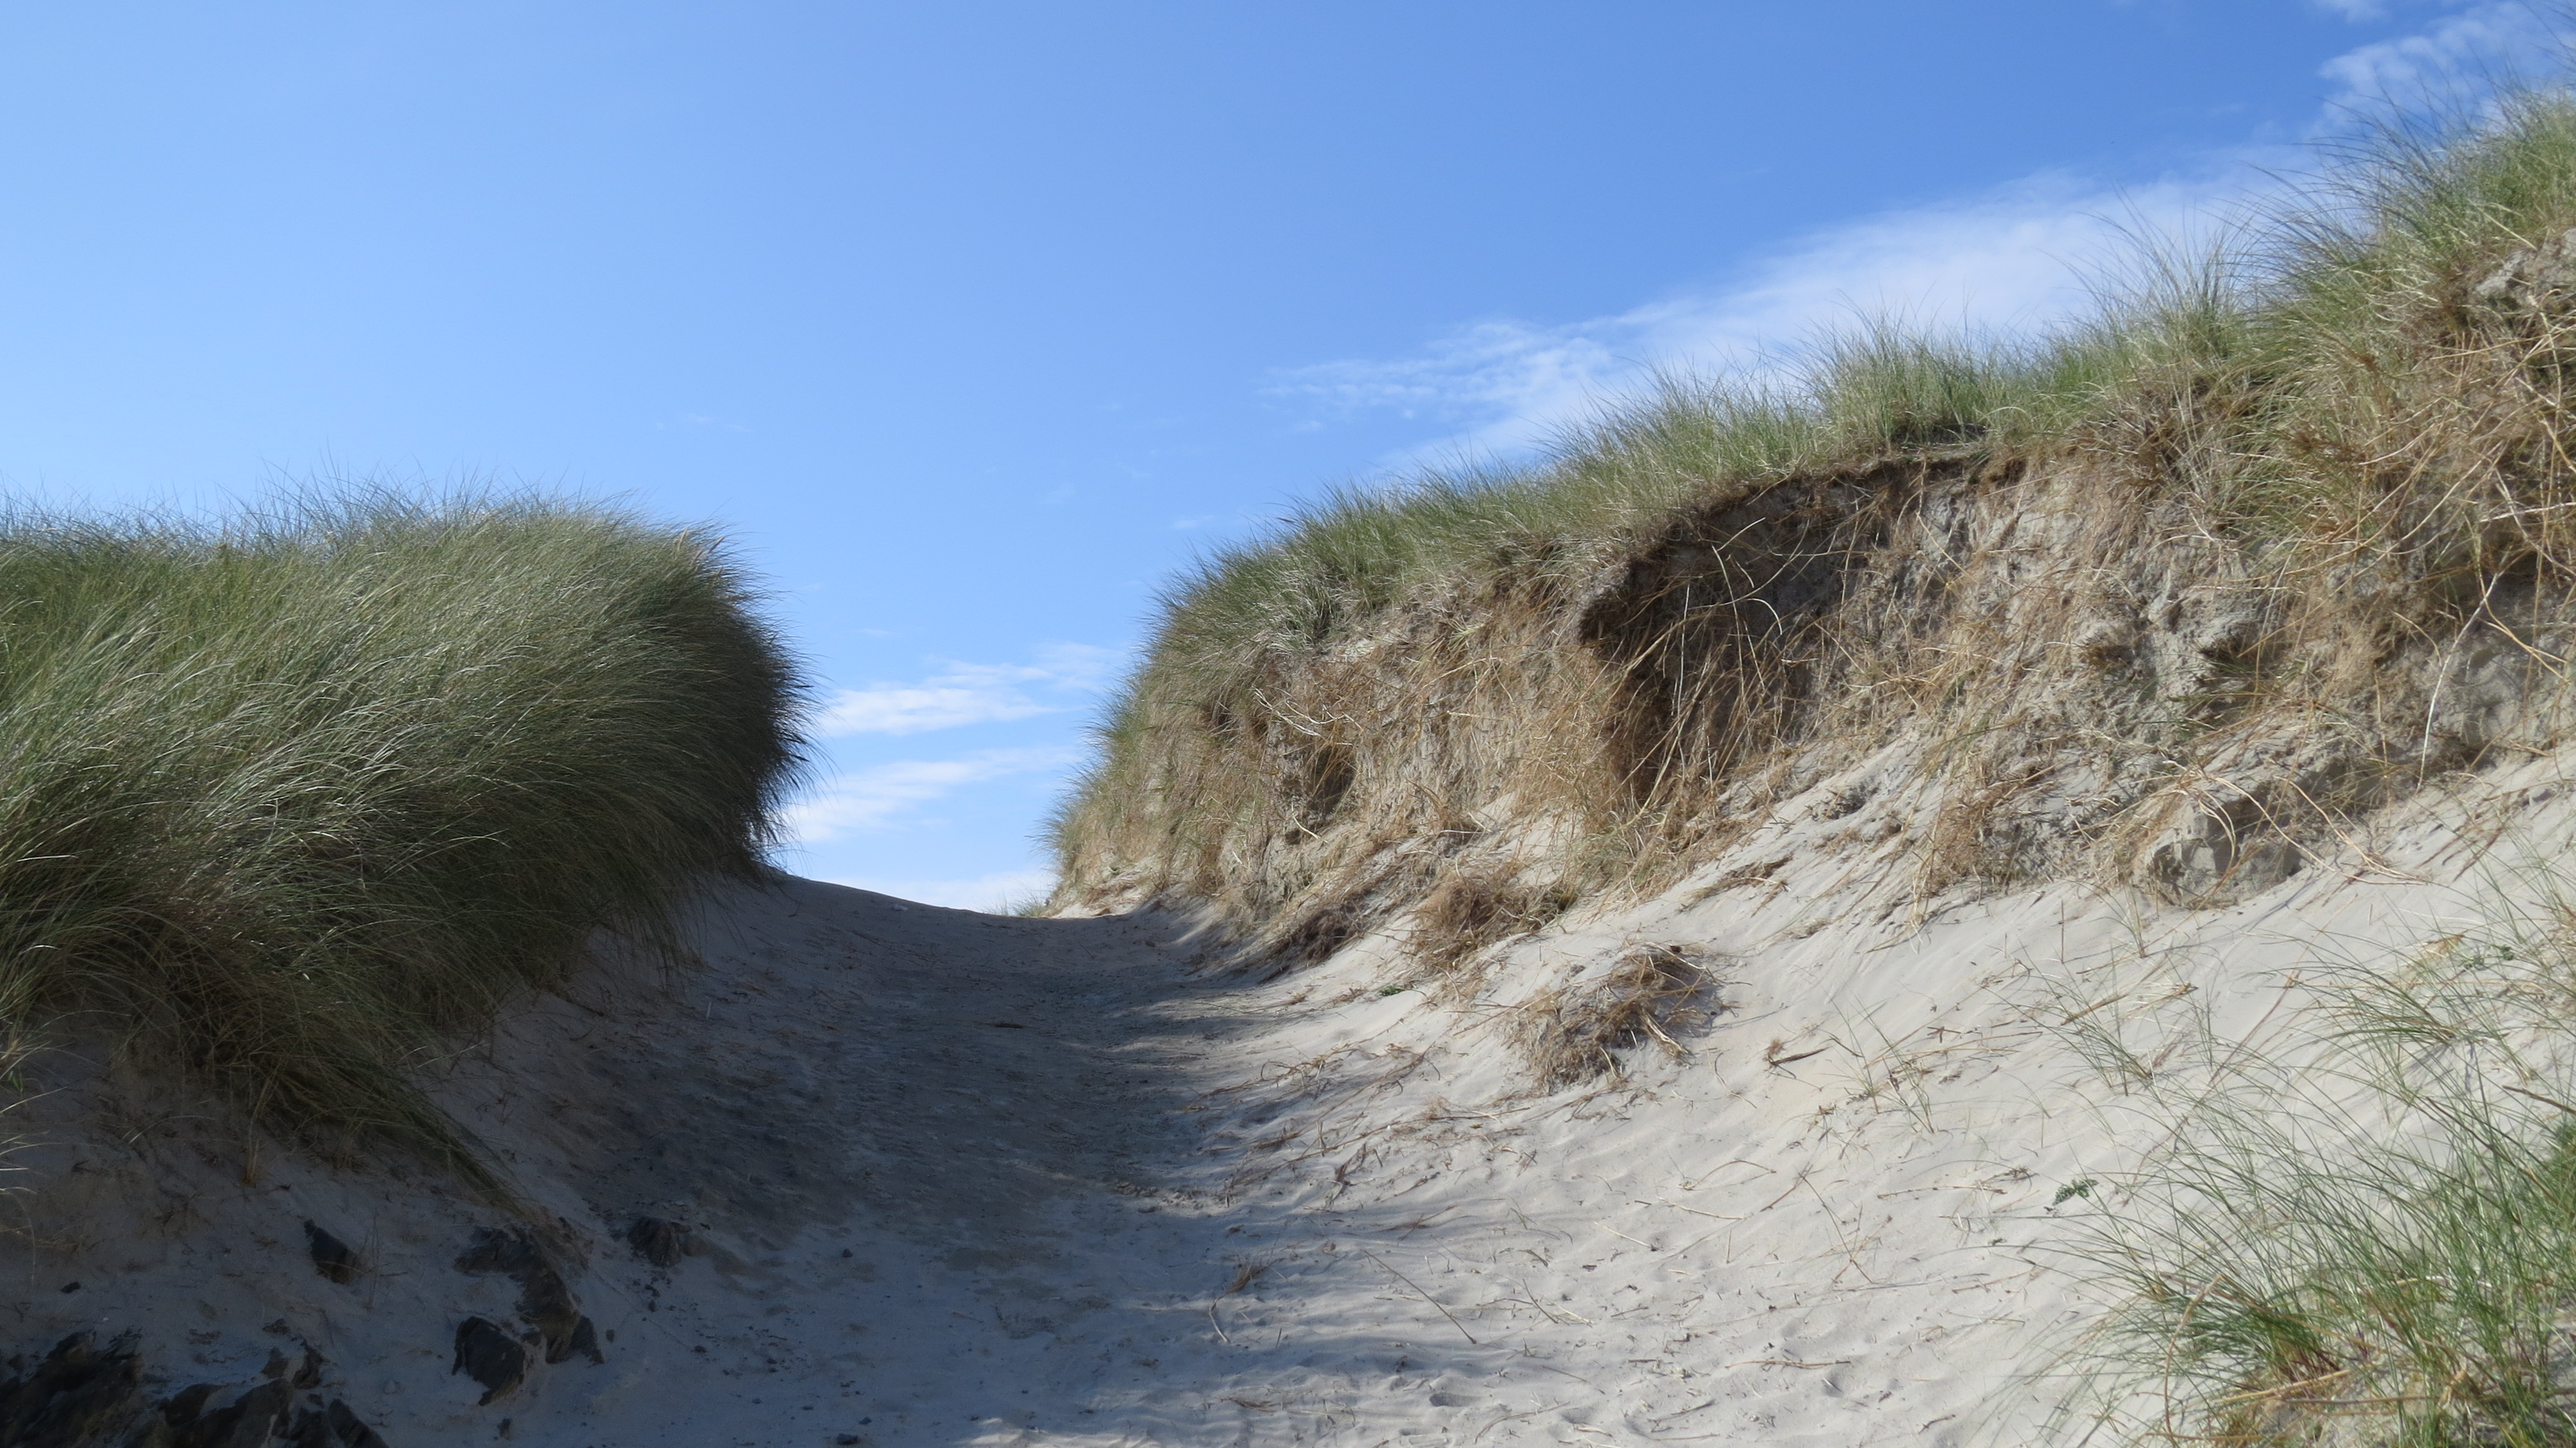 climb into the dunes